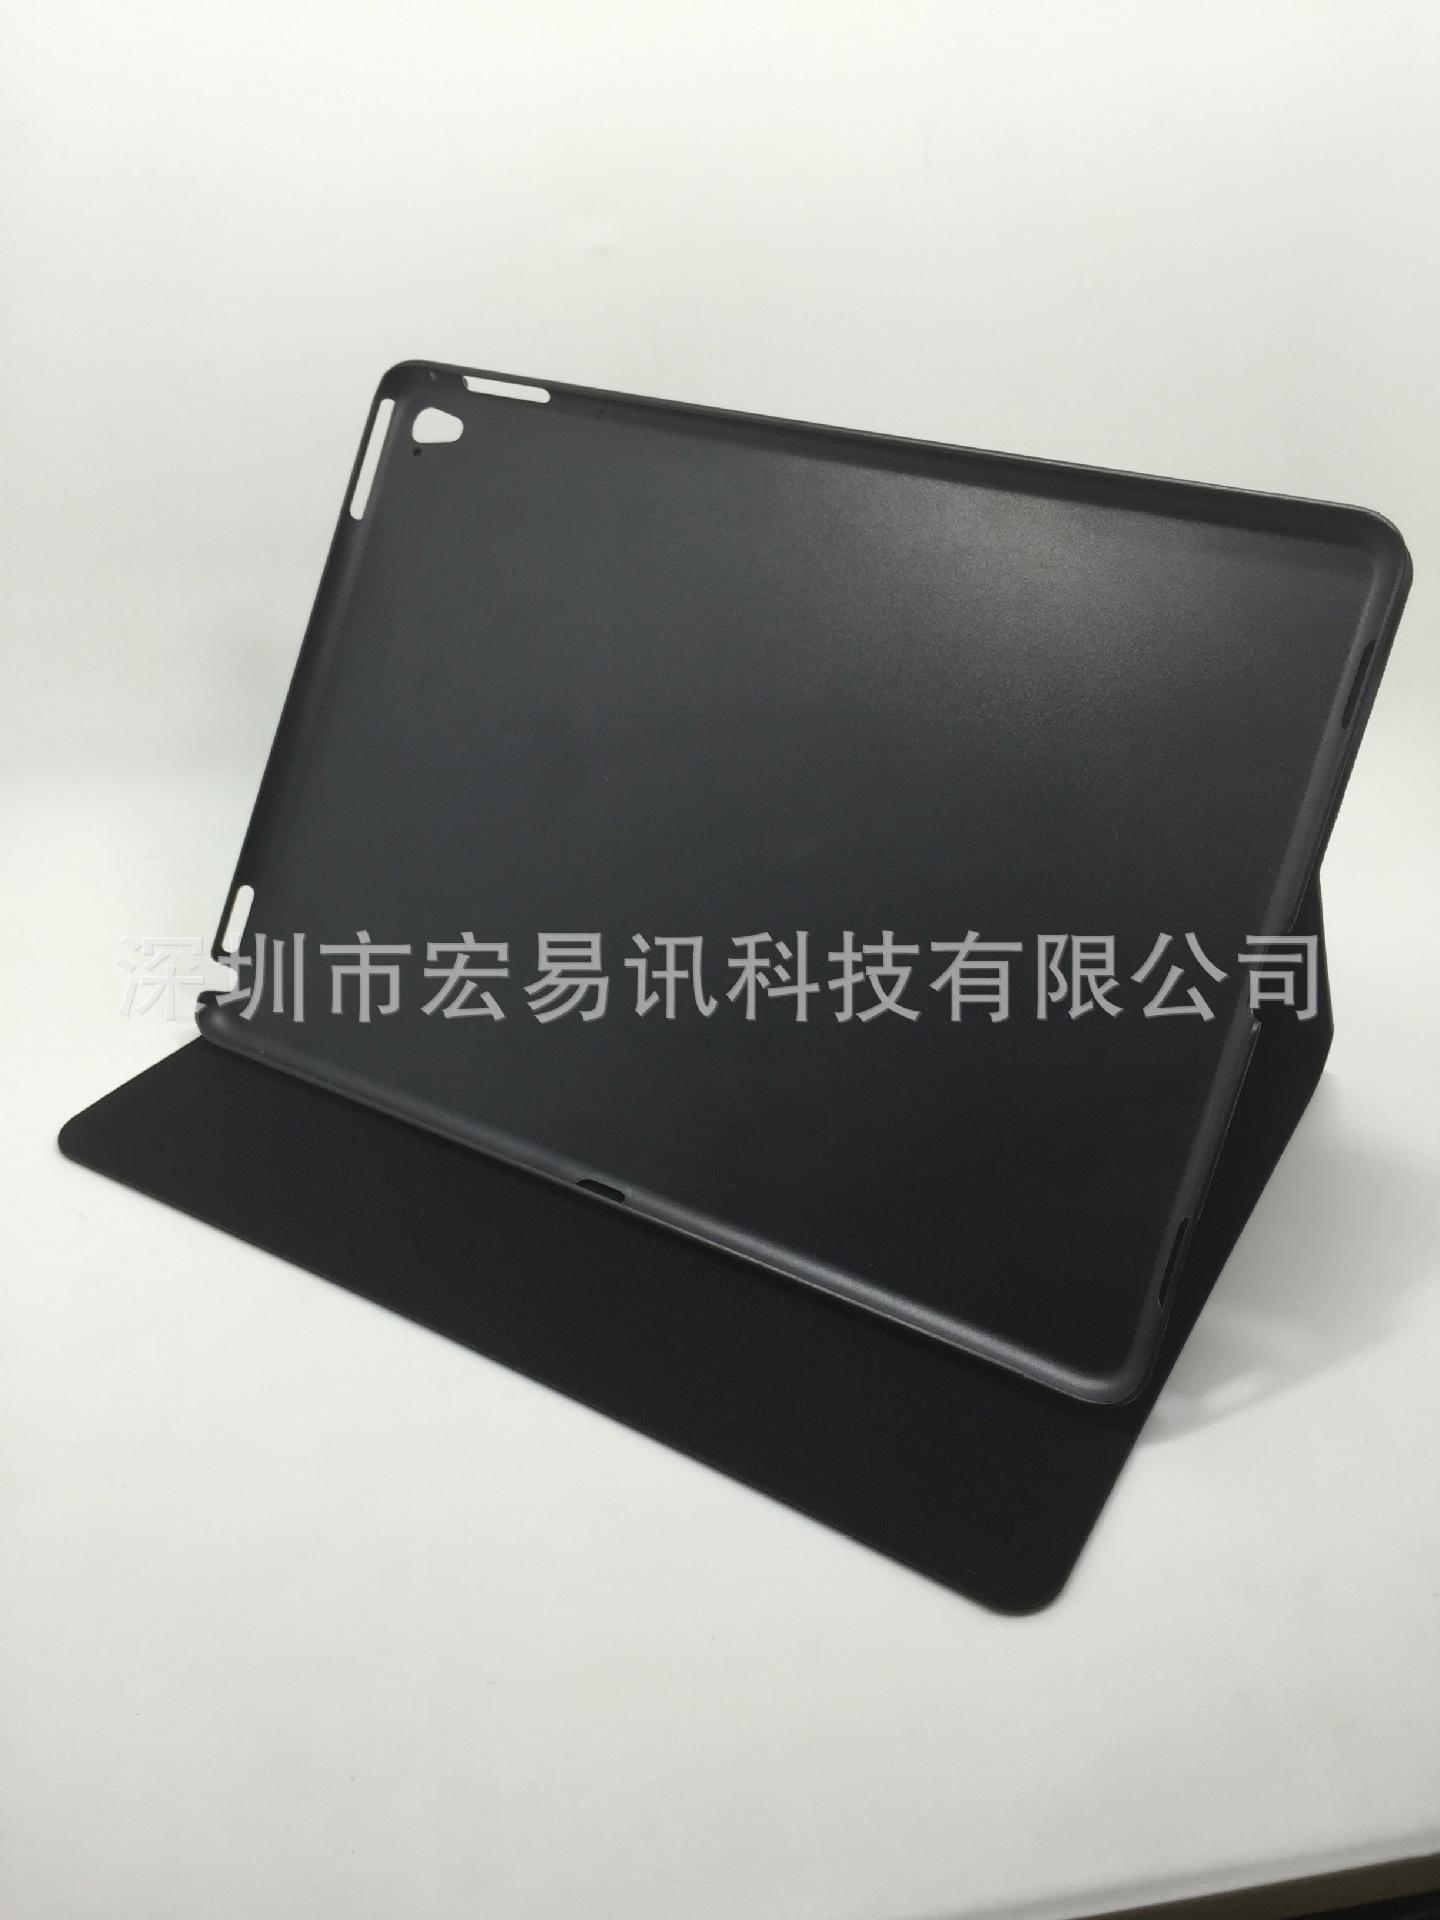 iPad Air 3-Case geleaked?-accessoire-ipad-air3-ipad7-coque-protection-01.jpg